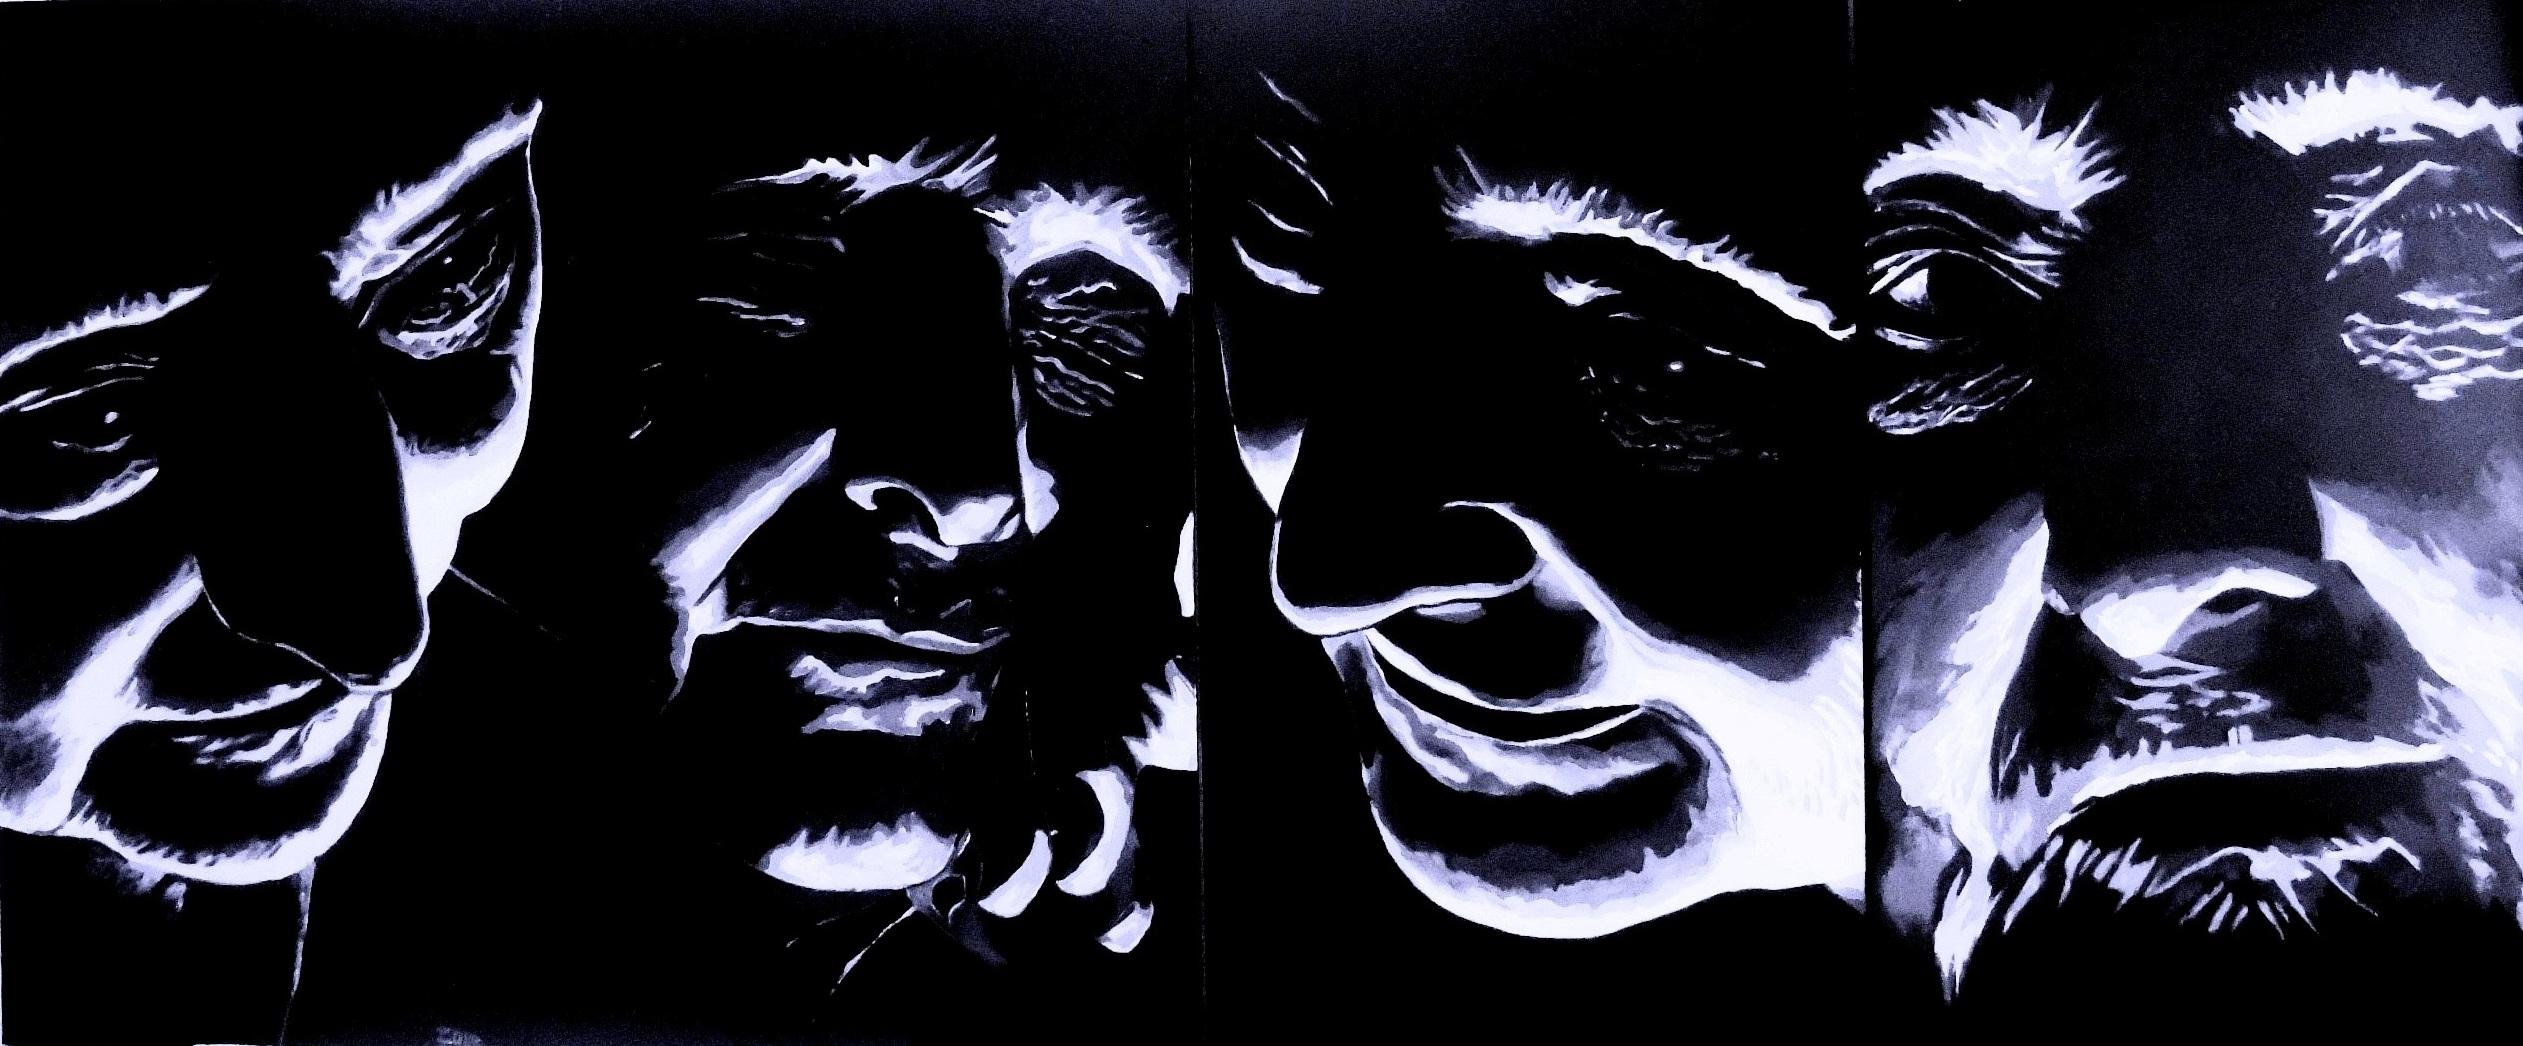 fresque noir et blanc   coller dernier (3).JPG